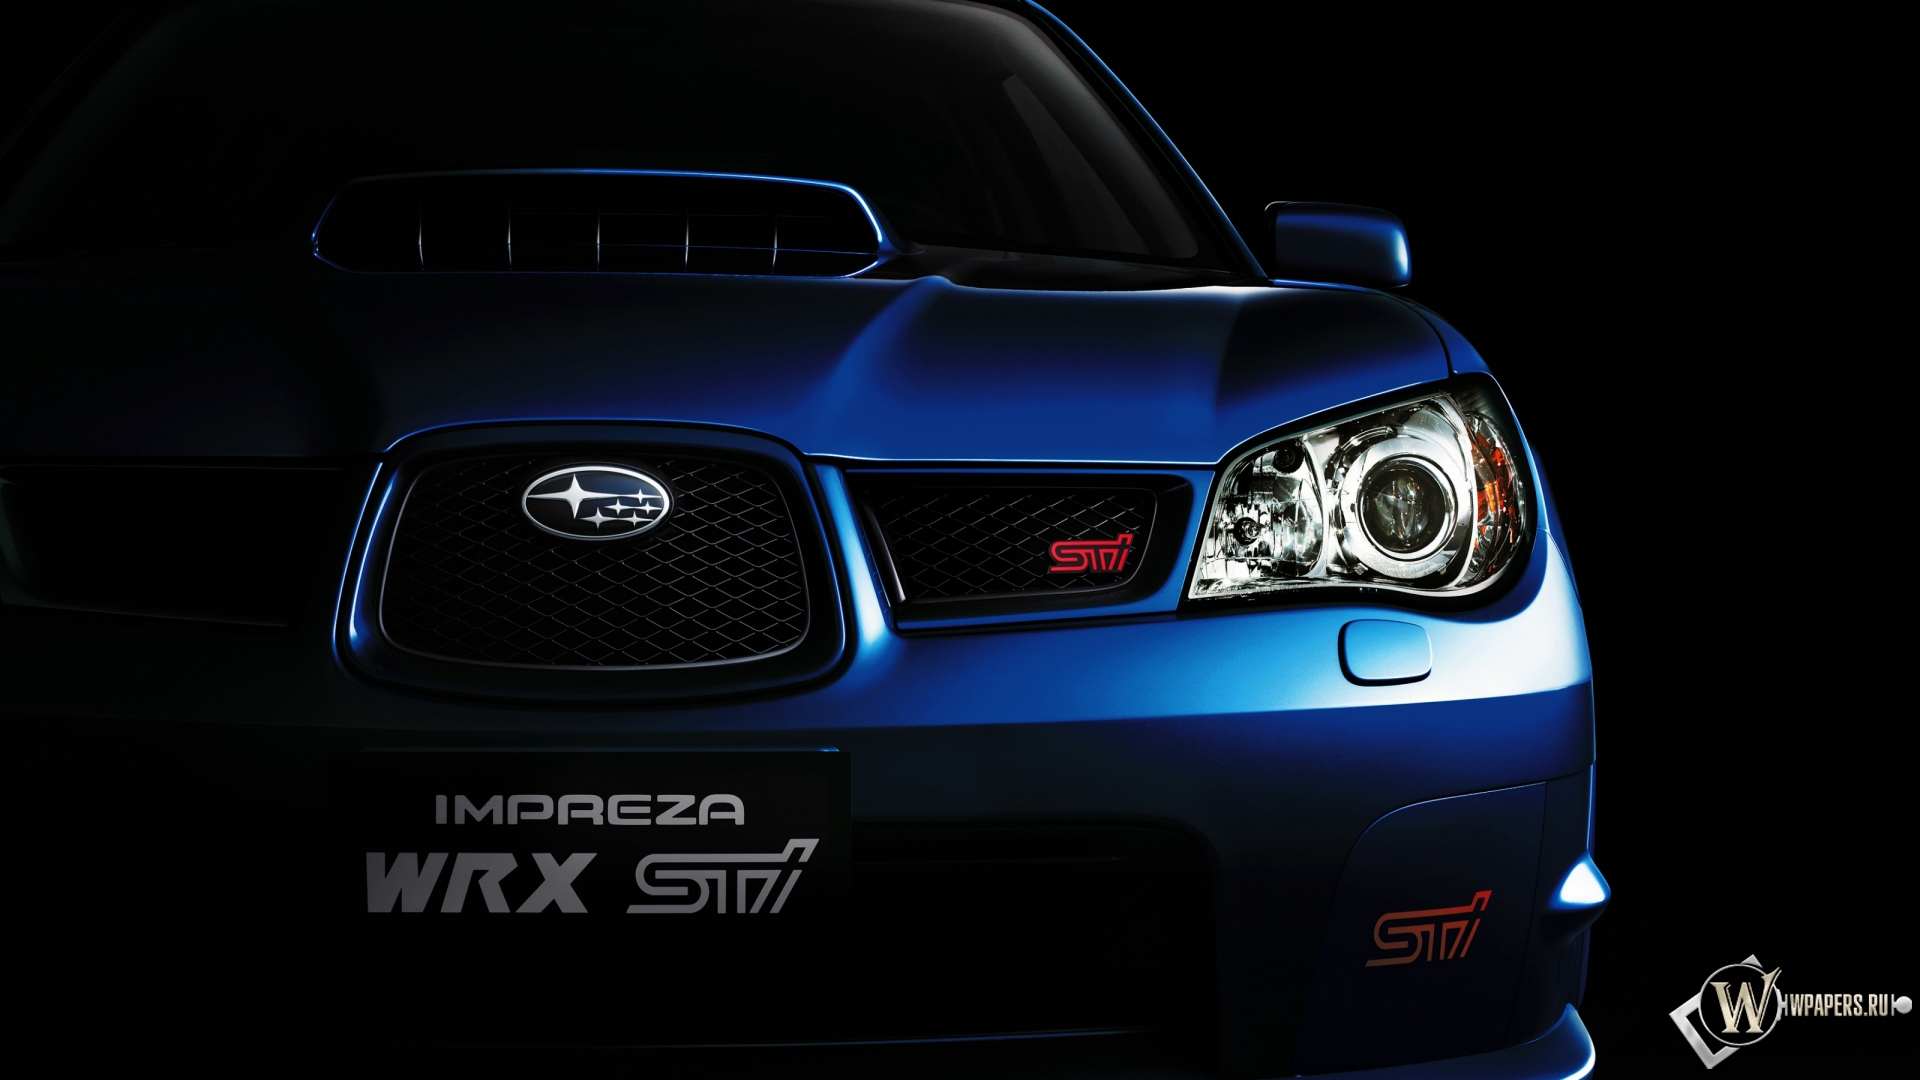 Subaru impreza wrx sti обои для рабочего стола 7